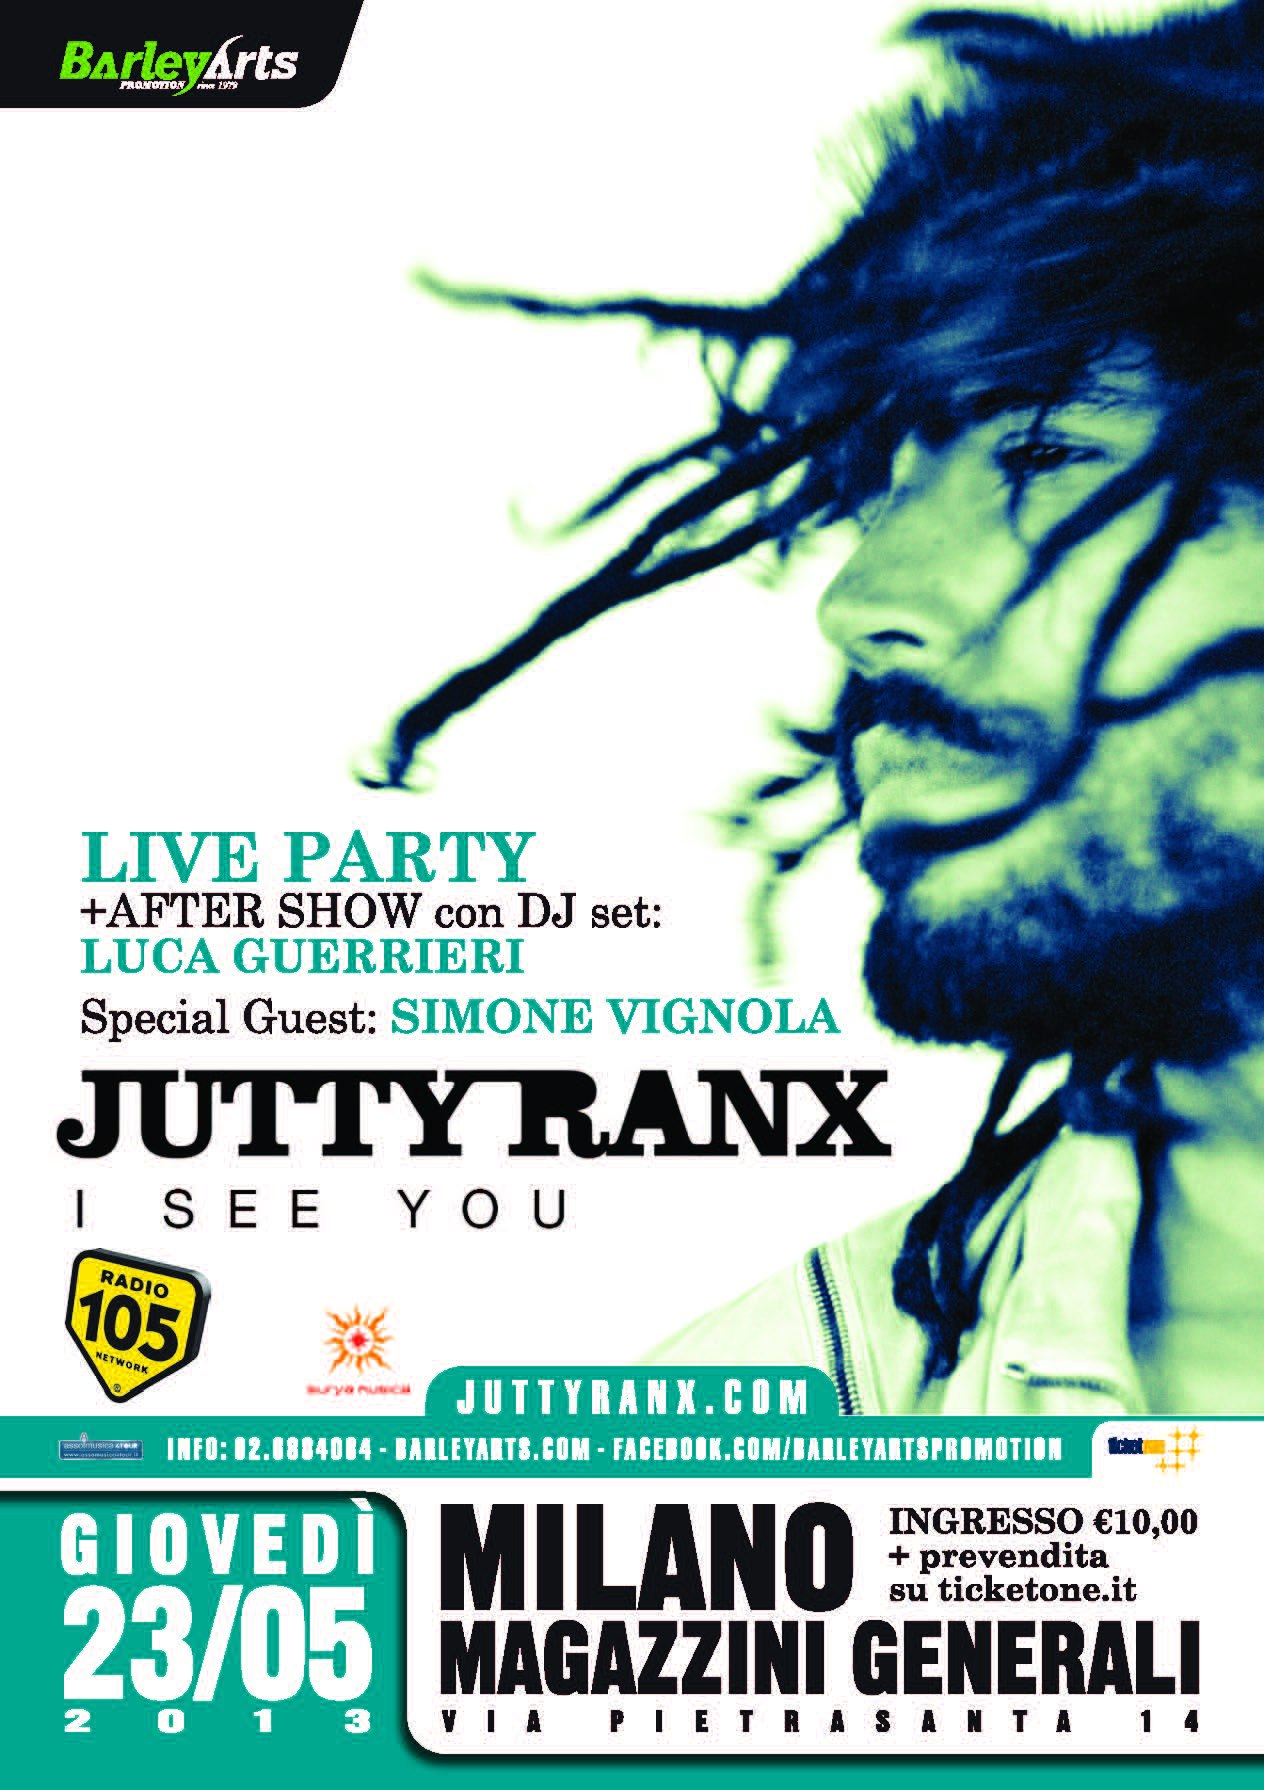 JUTTY RANX - Opening act Simone Vignola